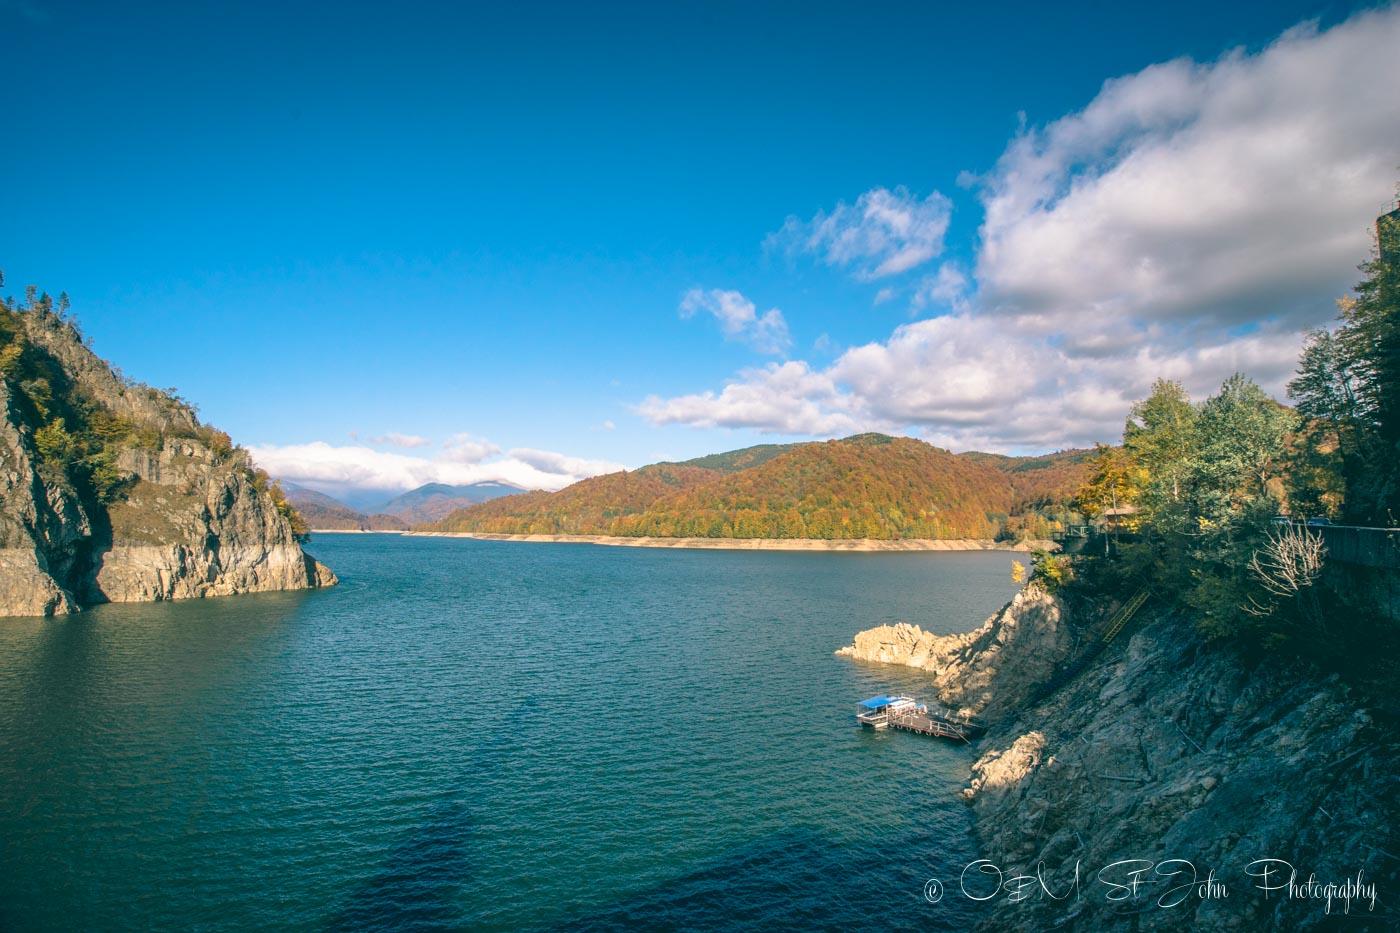 Lake Vidraru, along the Transfaragasan Highway. Roadtrip in Romania